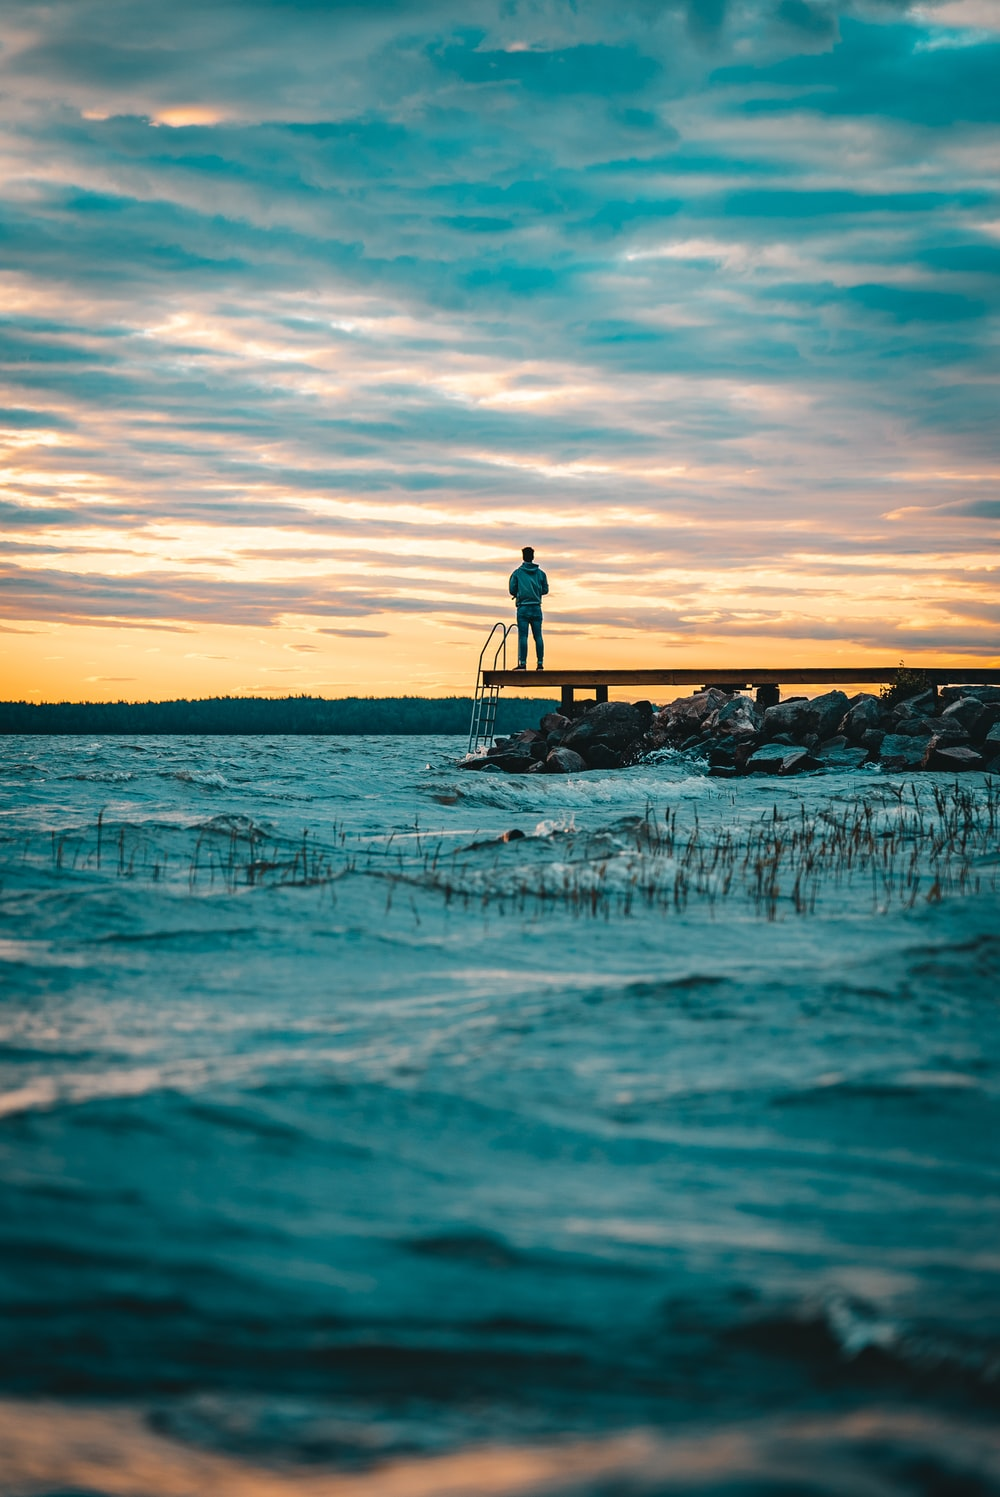 Person standing on bridge